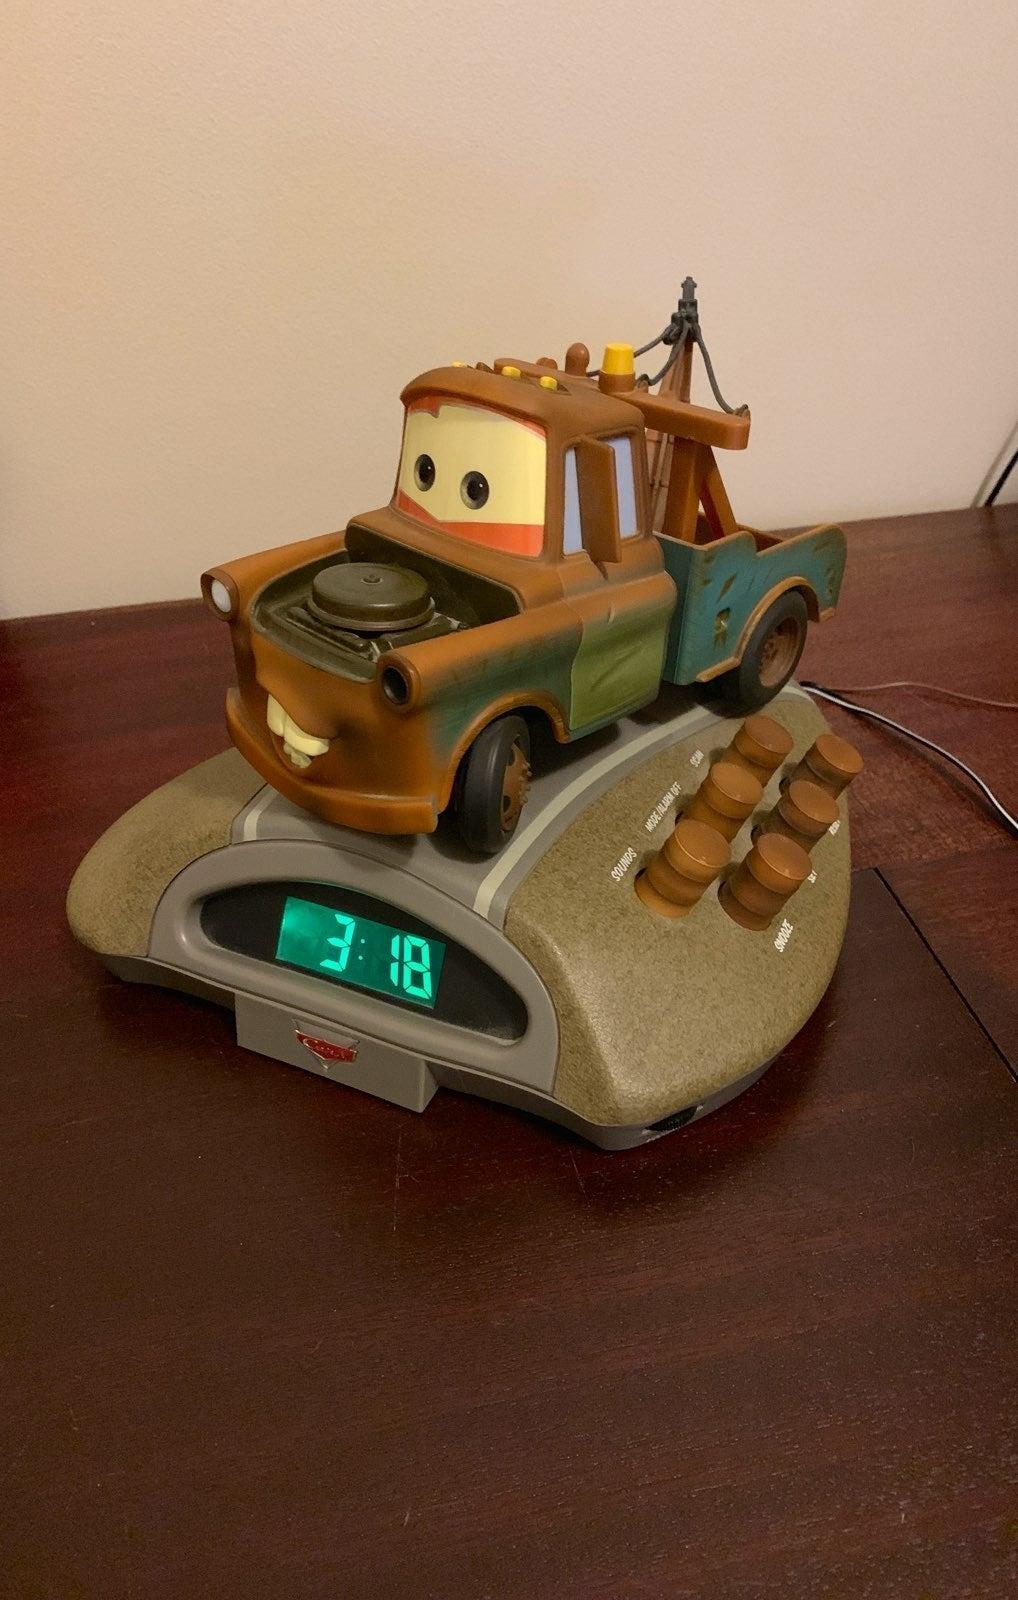 Cars Mater Talking Alarm Clock Radio